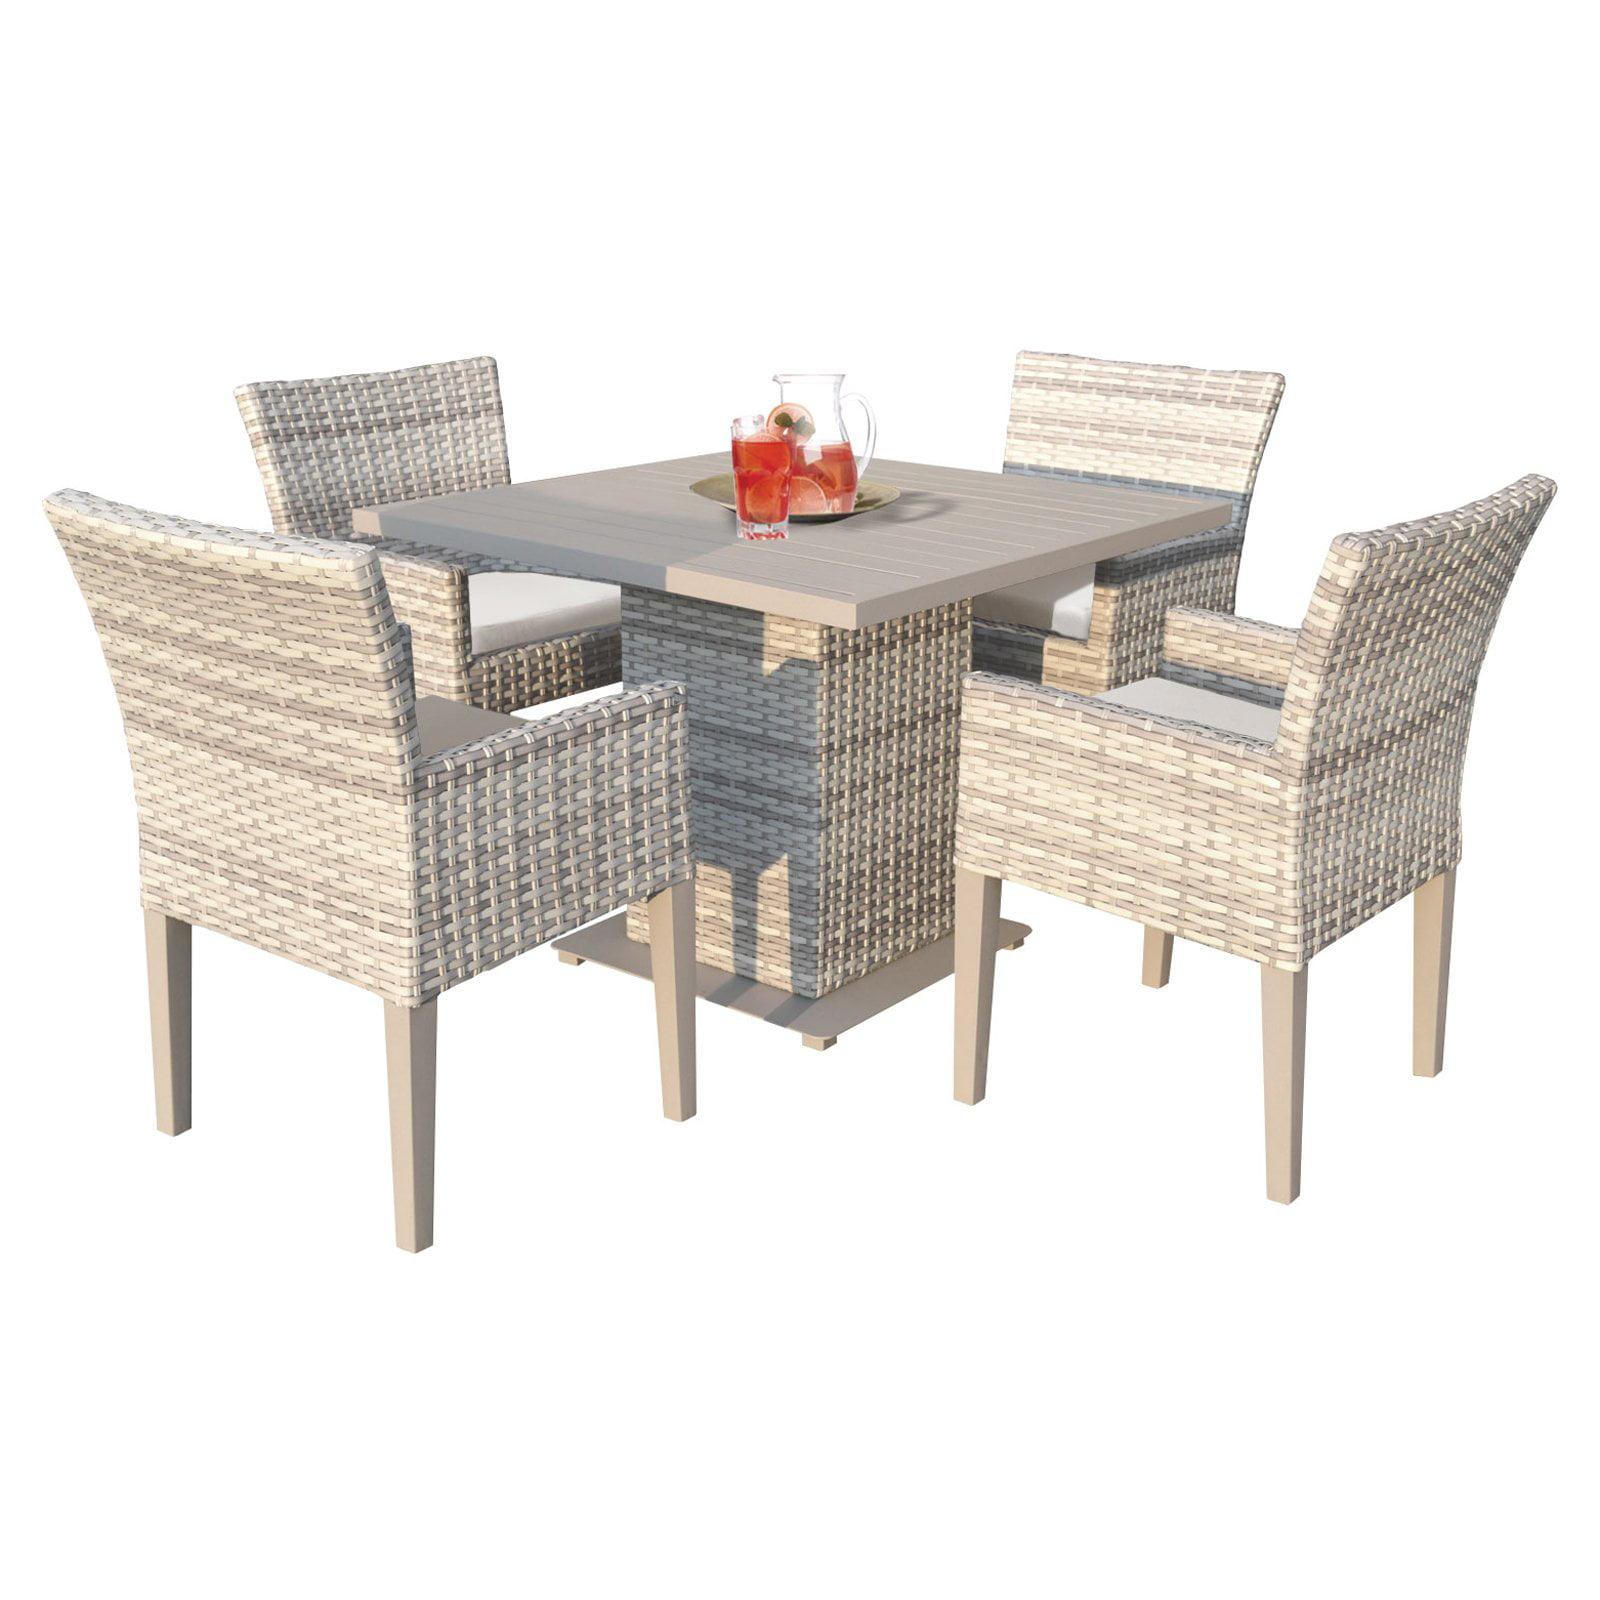 TK Classics Fairmont Wicker 5 Piece Square Table Patio Dining Set